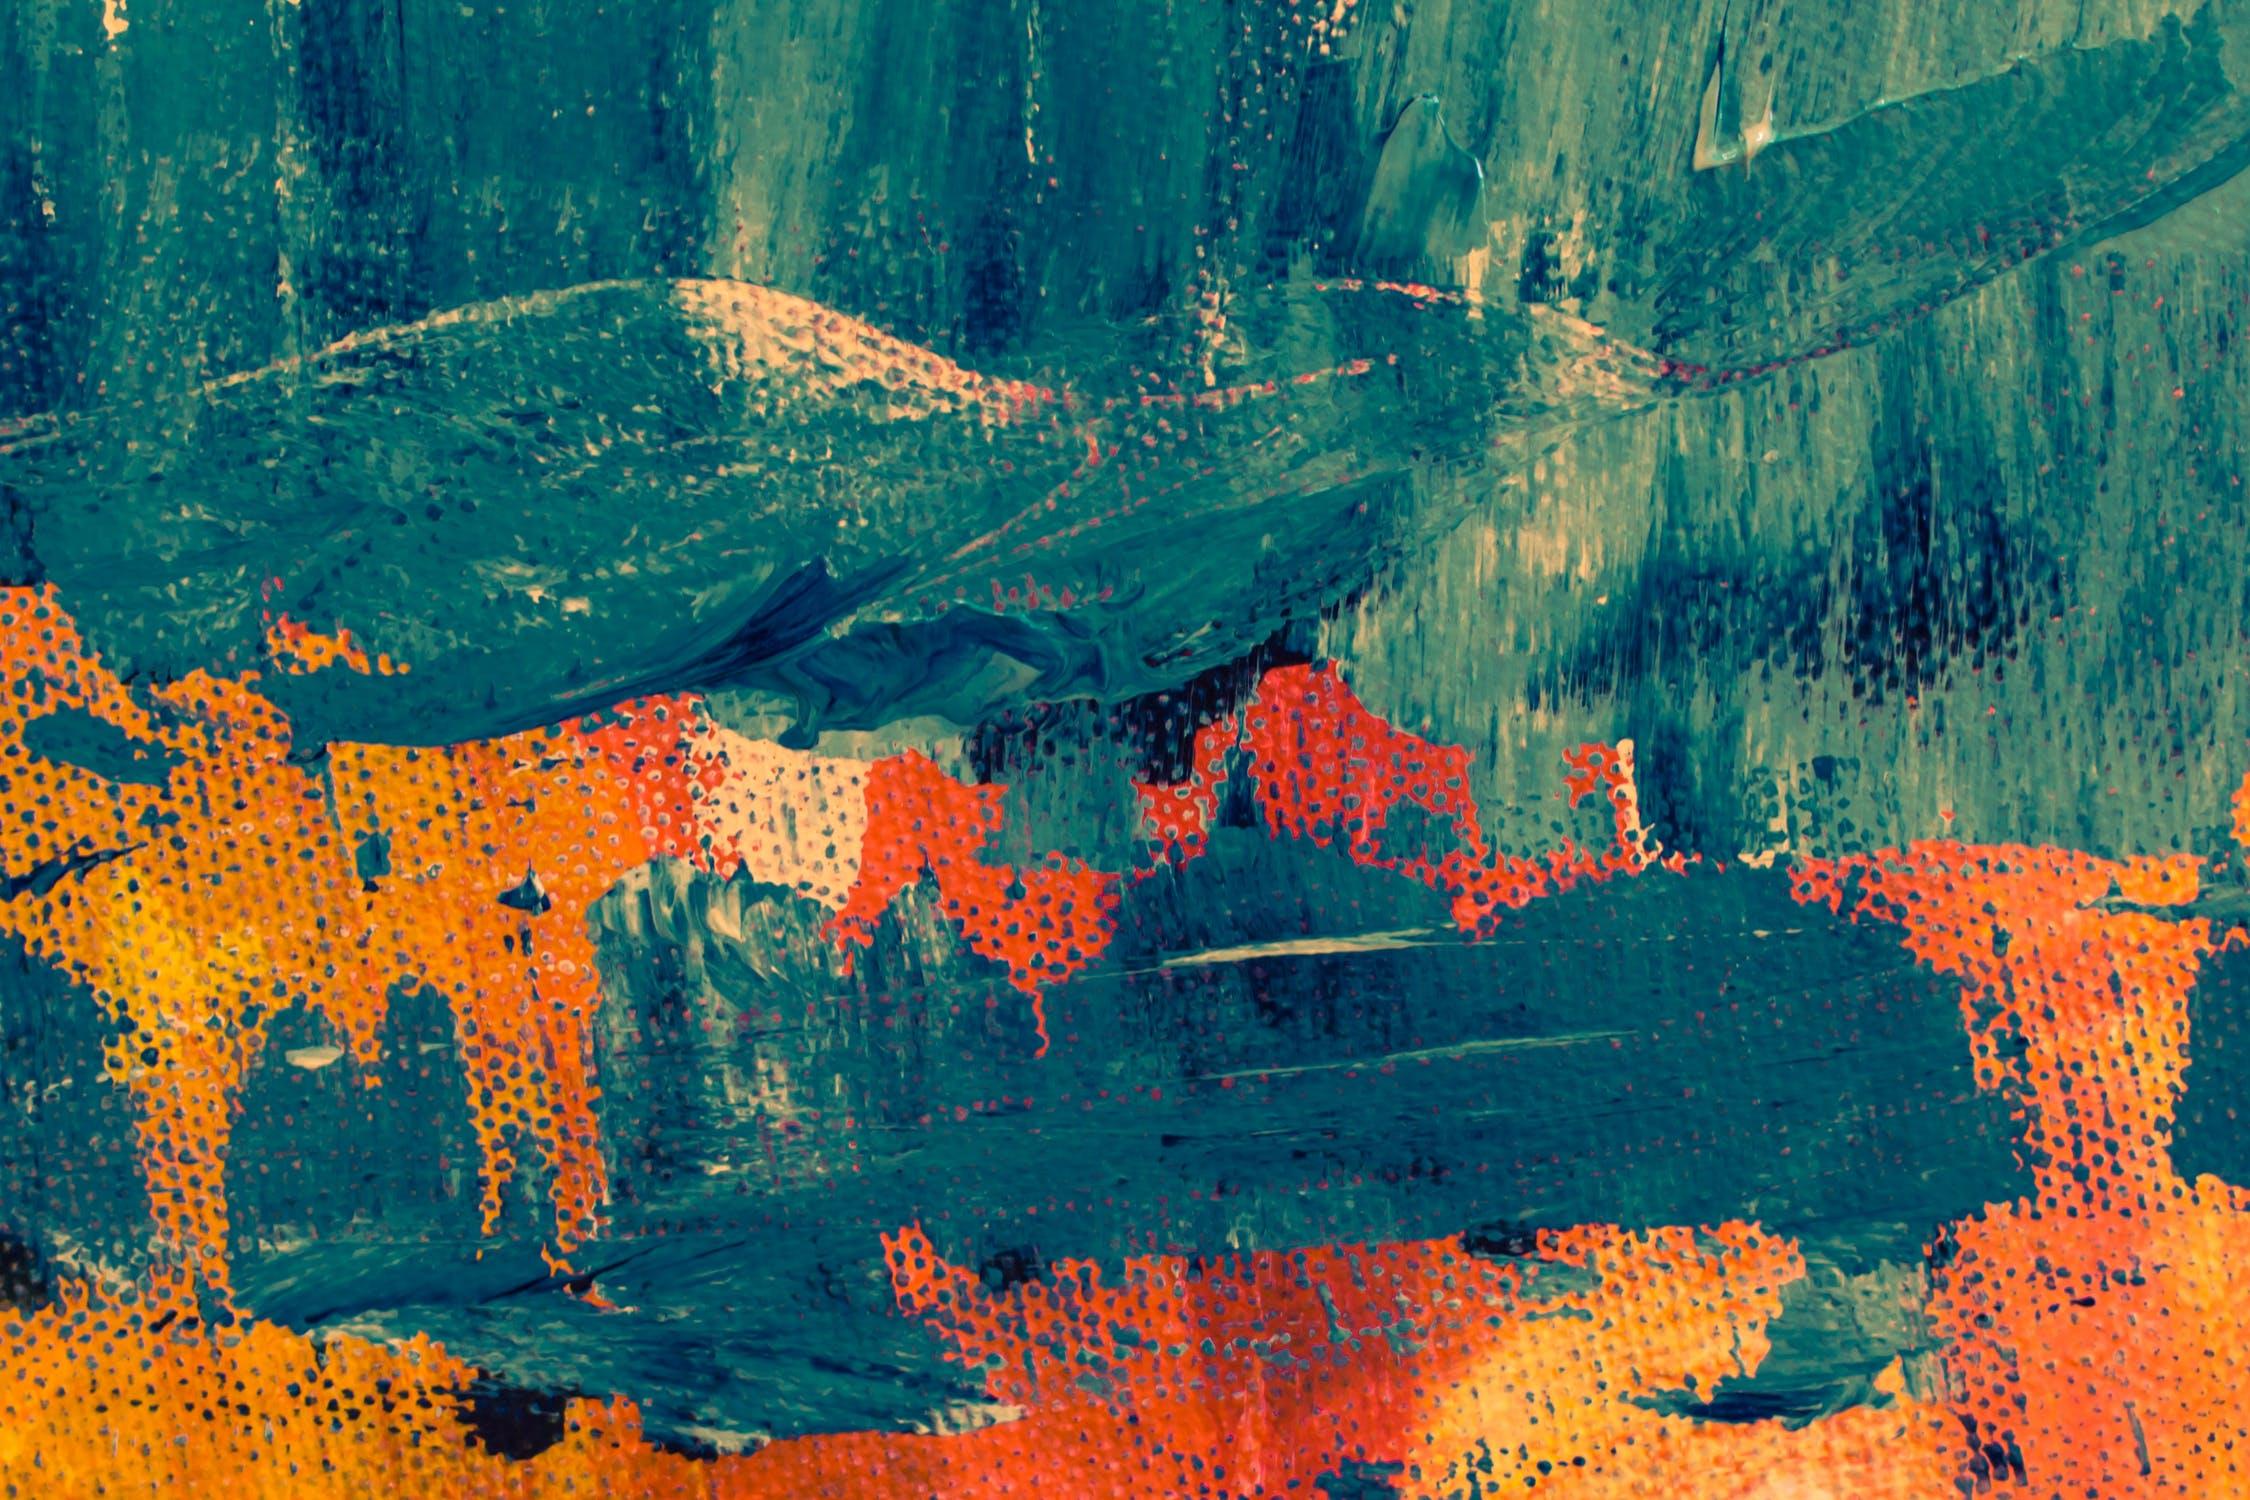 Digital Abstract Image